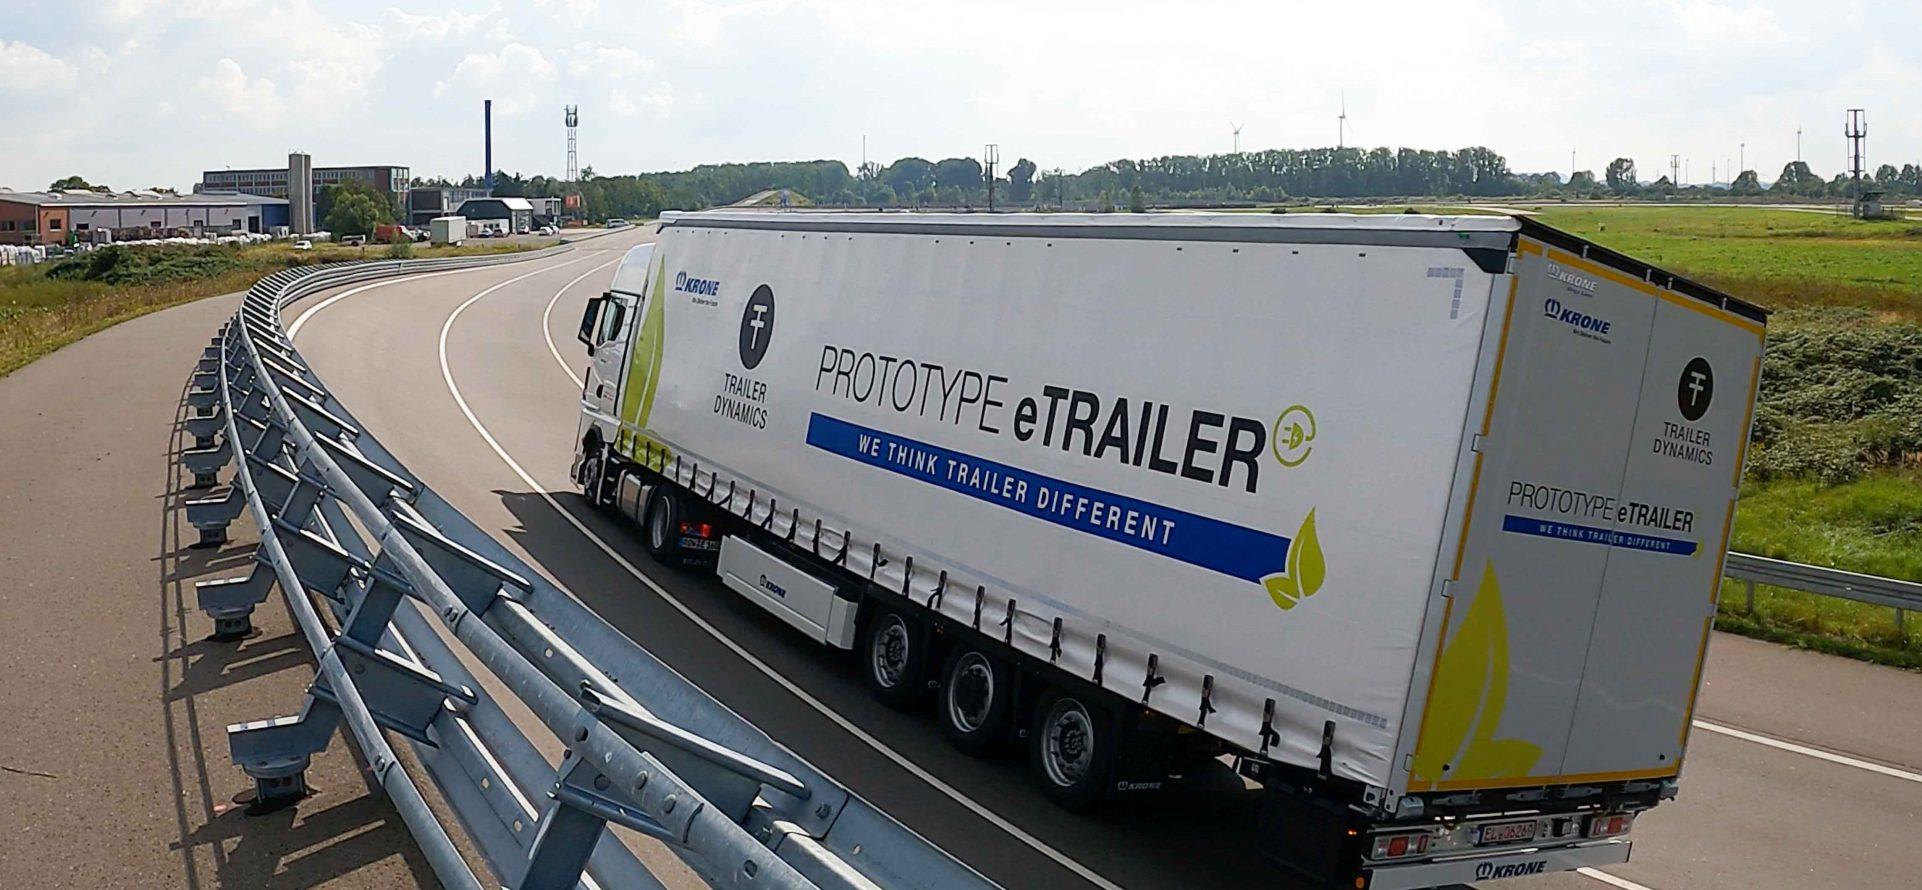 Dank E-Trailer: Hybridantrieb im Fernverkehr